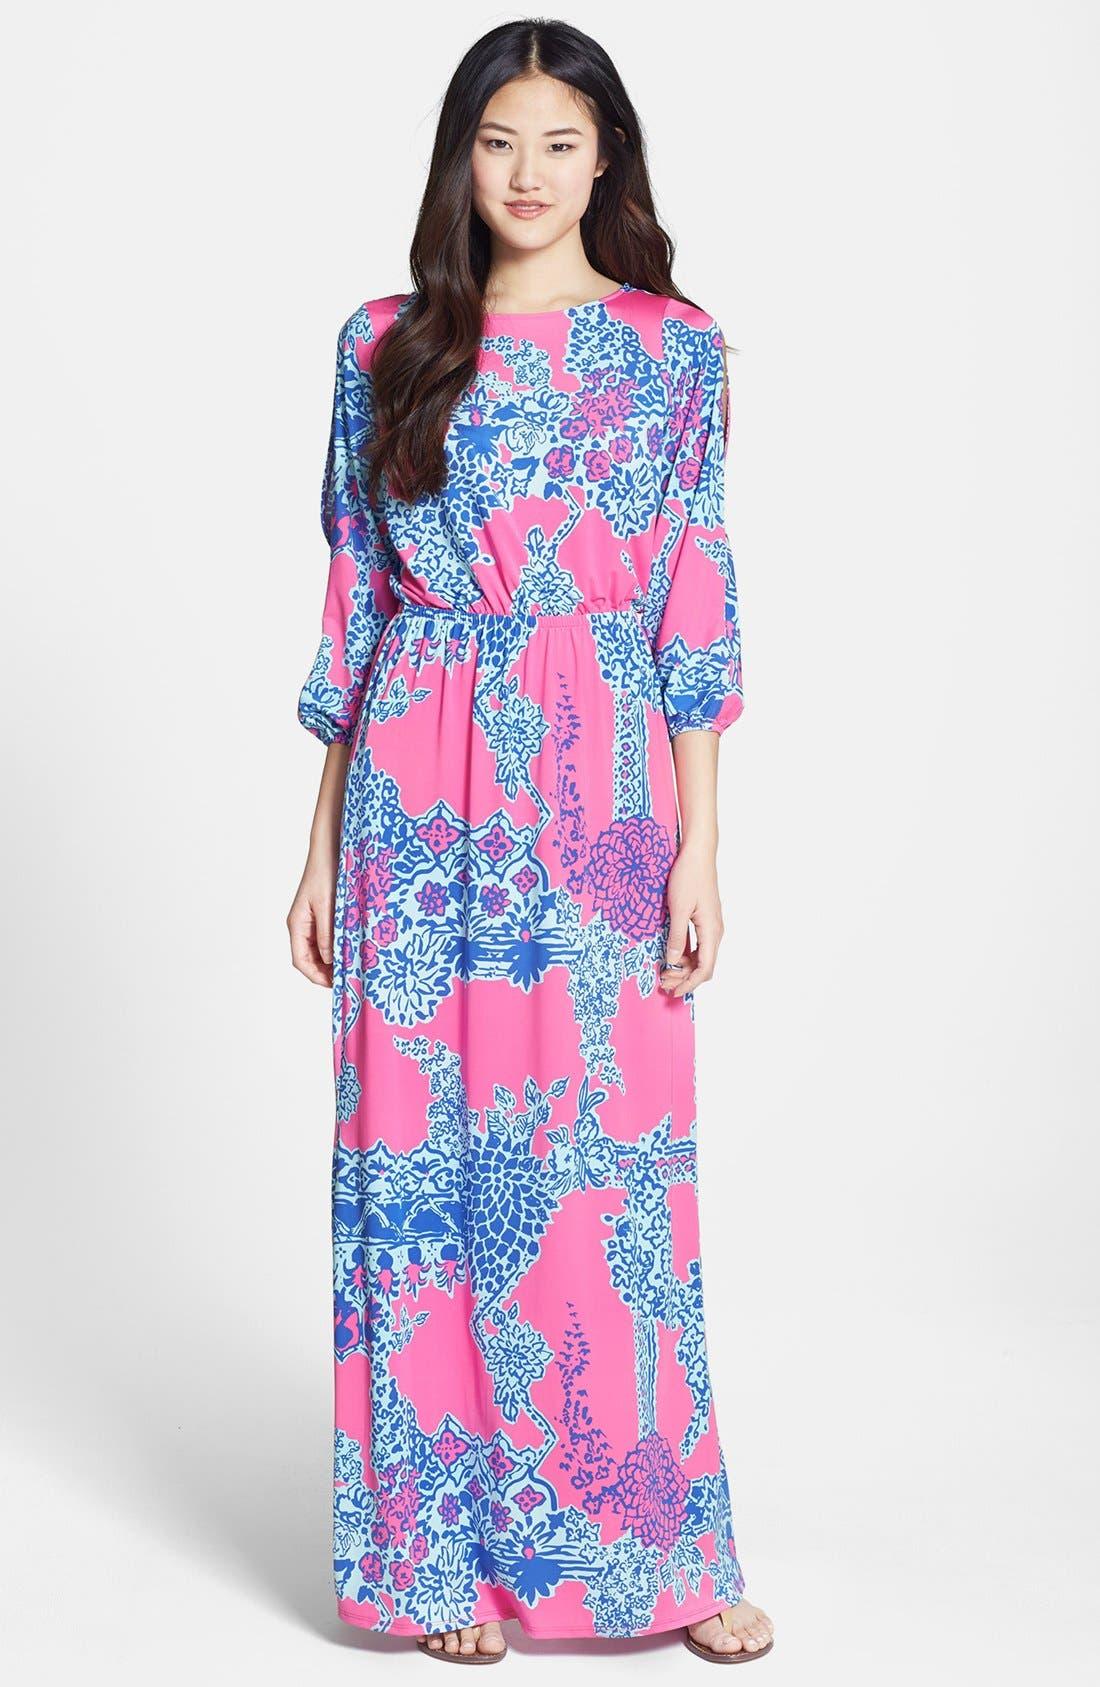 Main Image - Lilly Pulitzer® 'Ashlynn' Print Jersey Maxi Dress